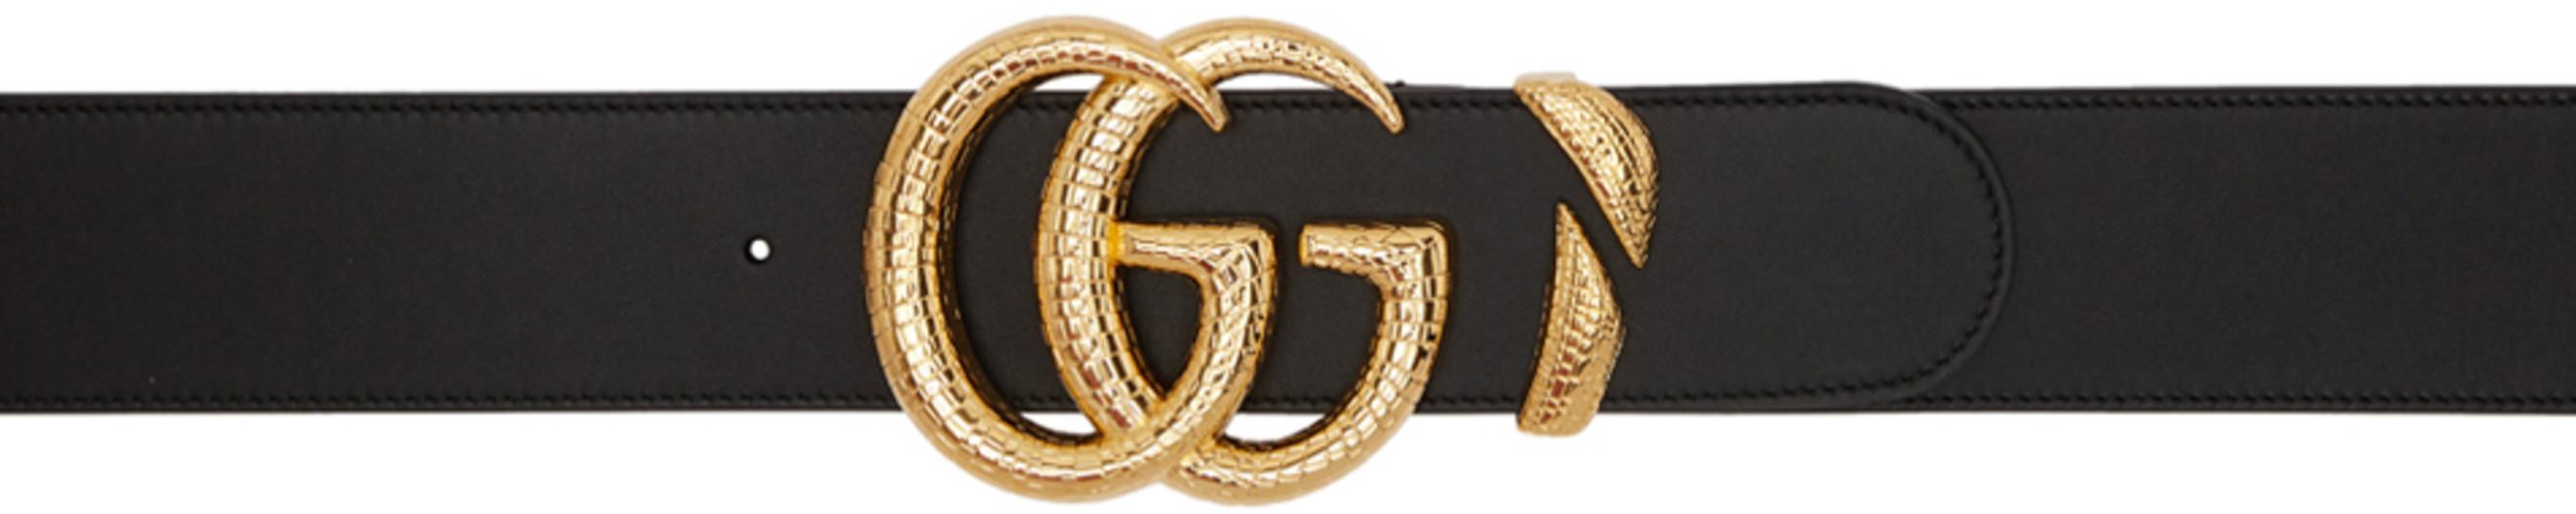 b5bdc61c21536f Gucci belts & suspenders for Women   SSENSE